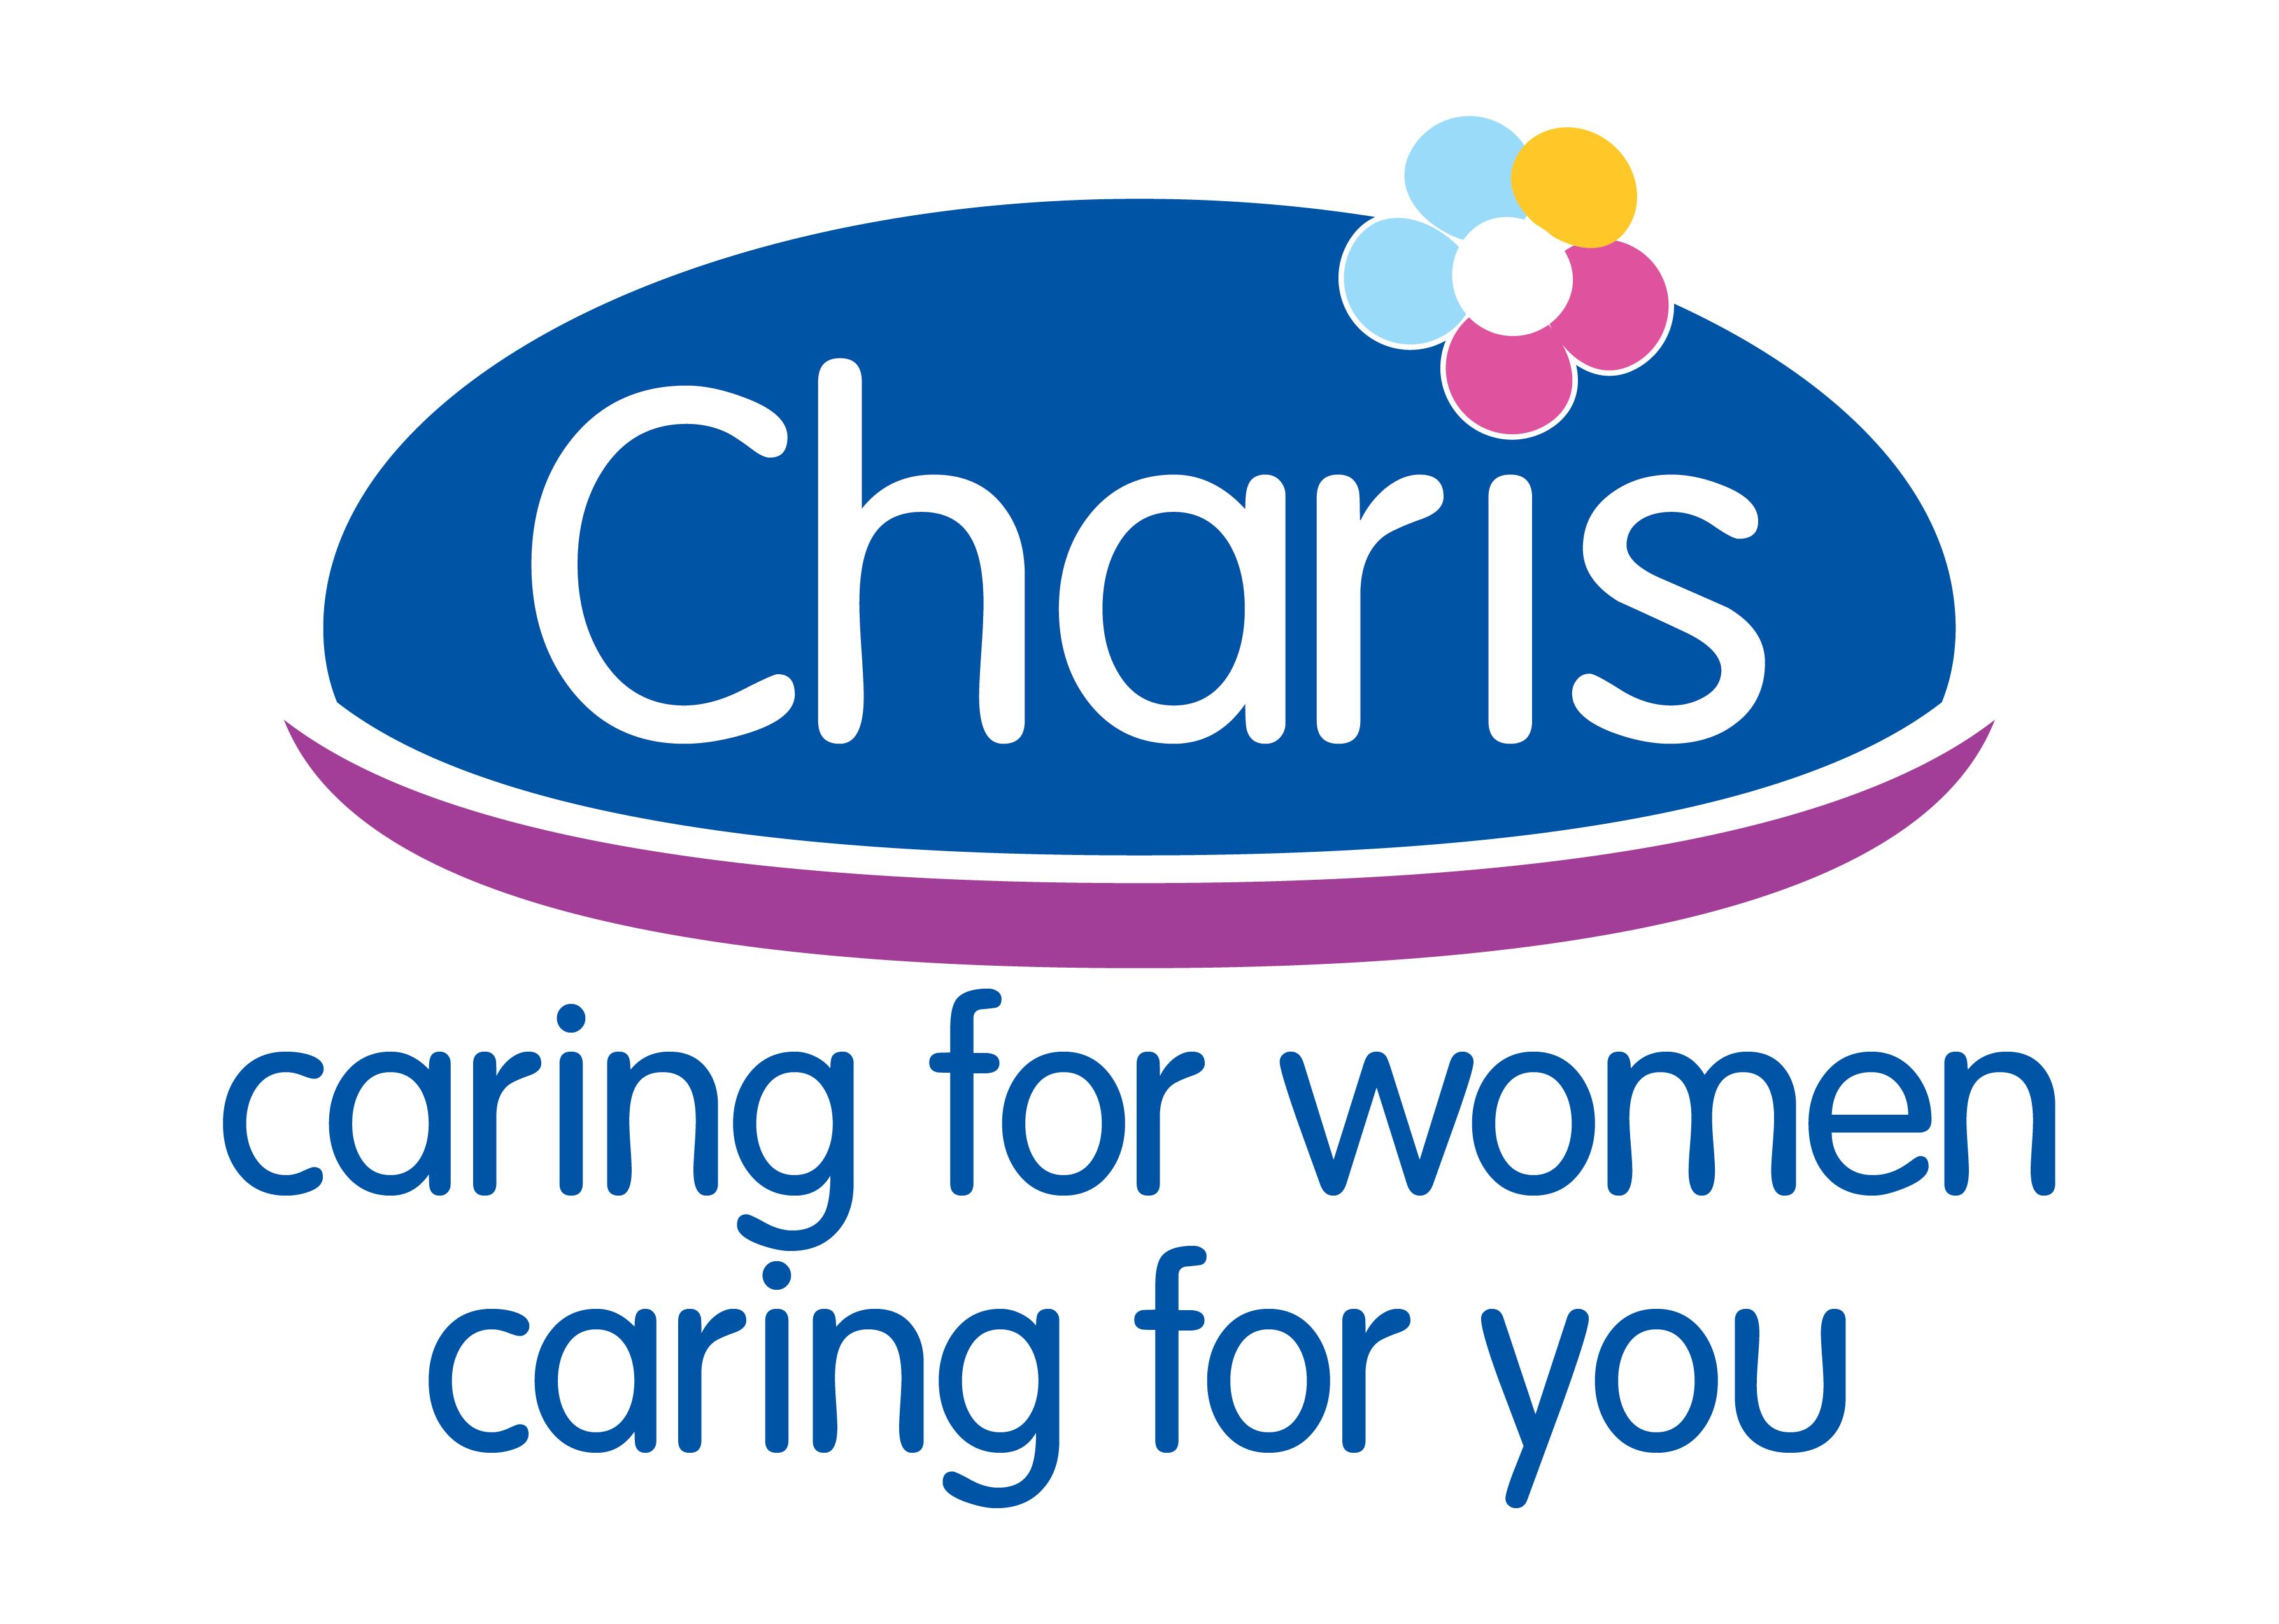 CharisLogo